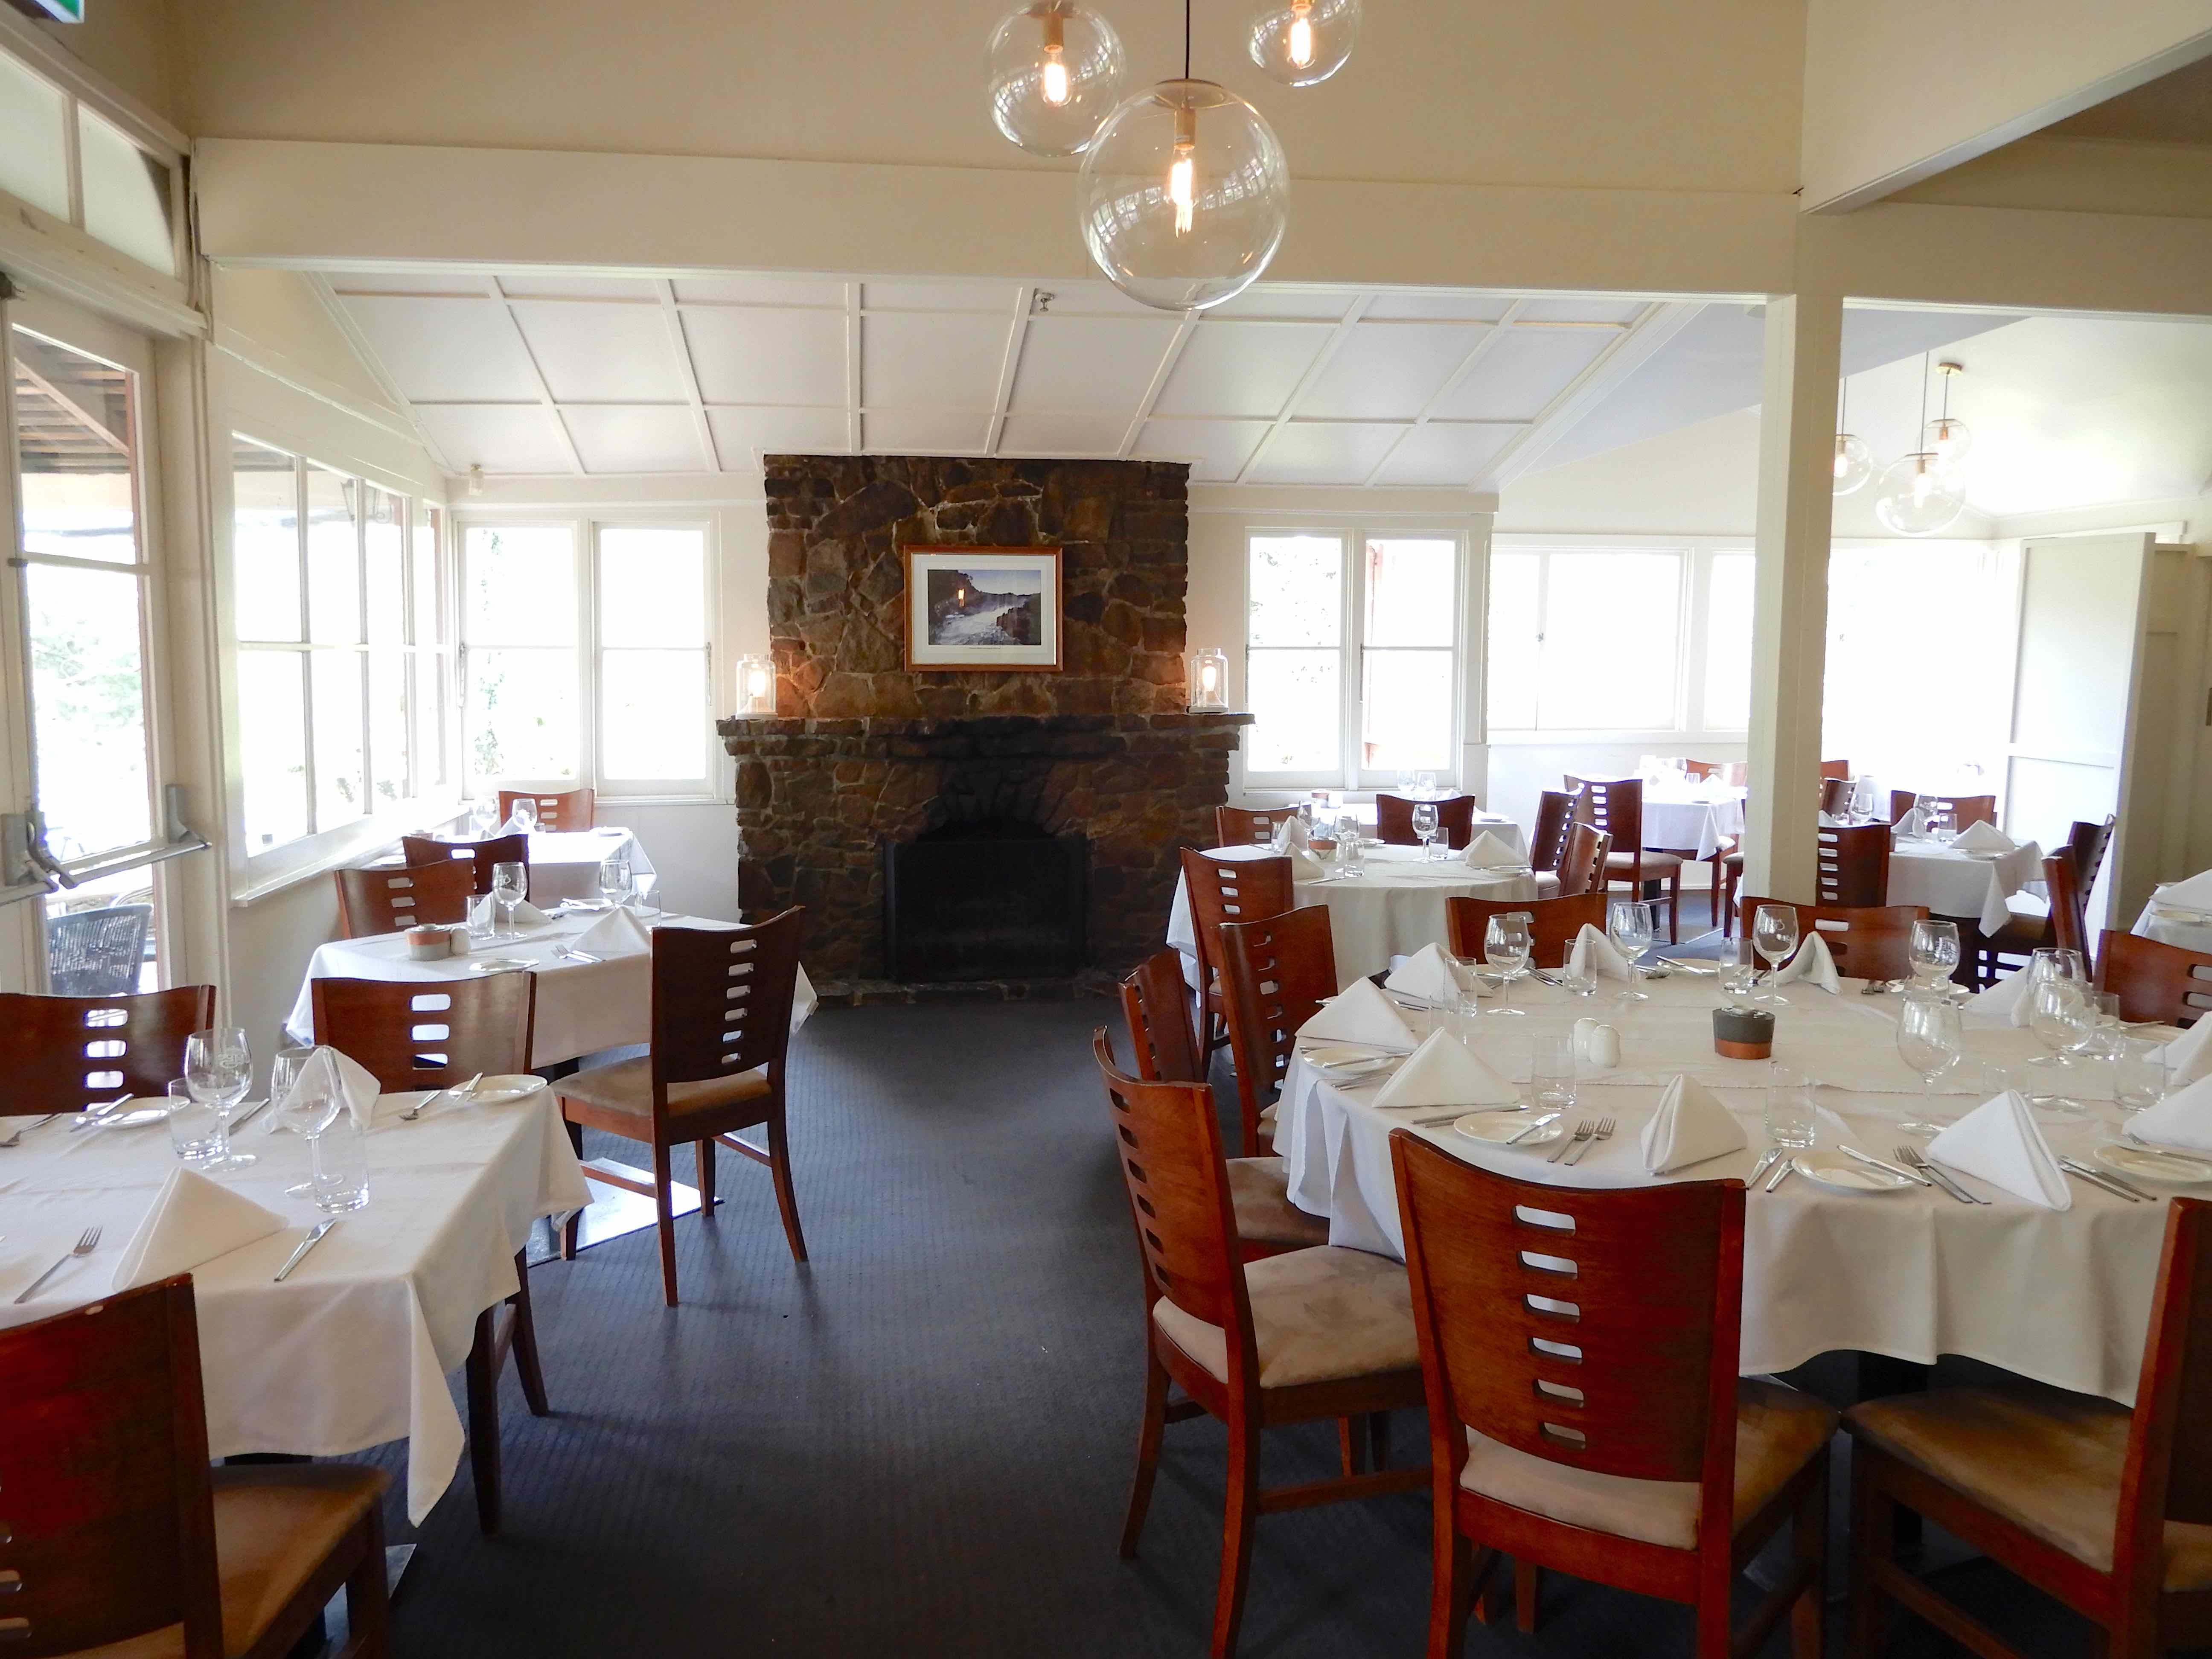 3.The Gorge Restaurant